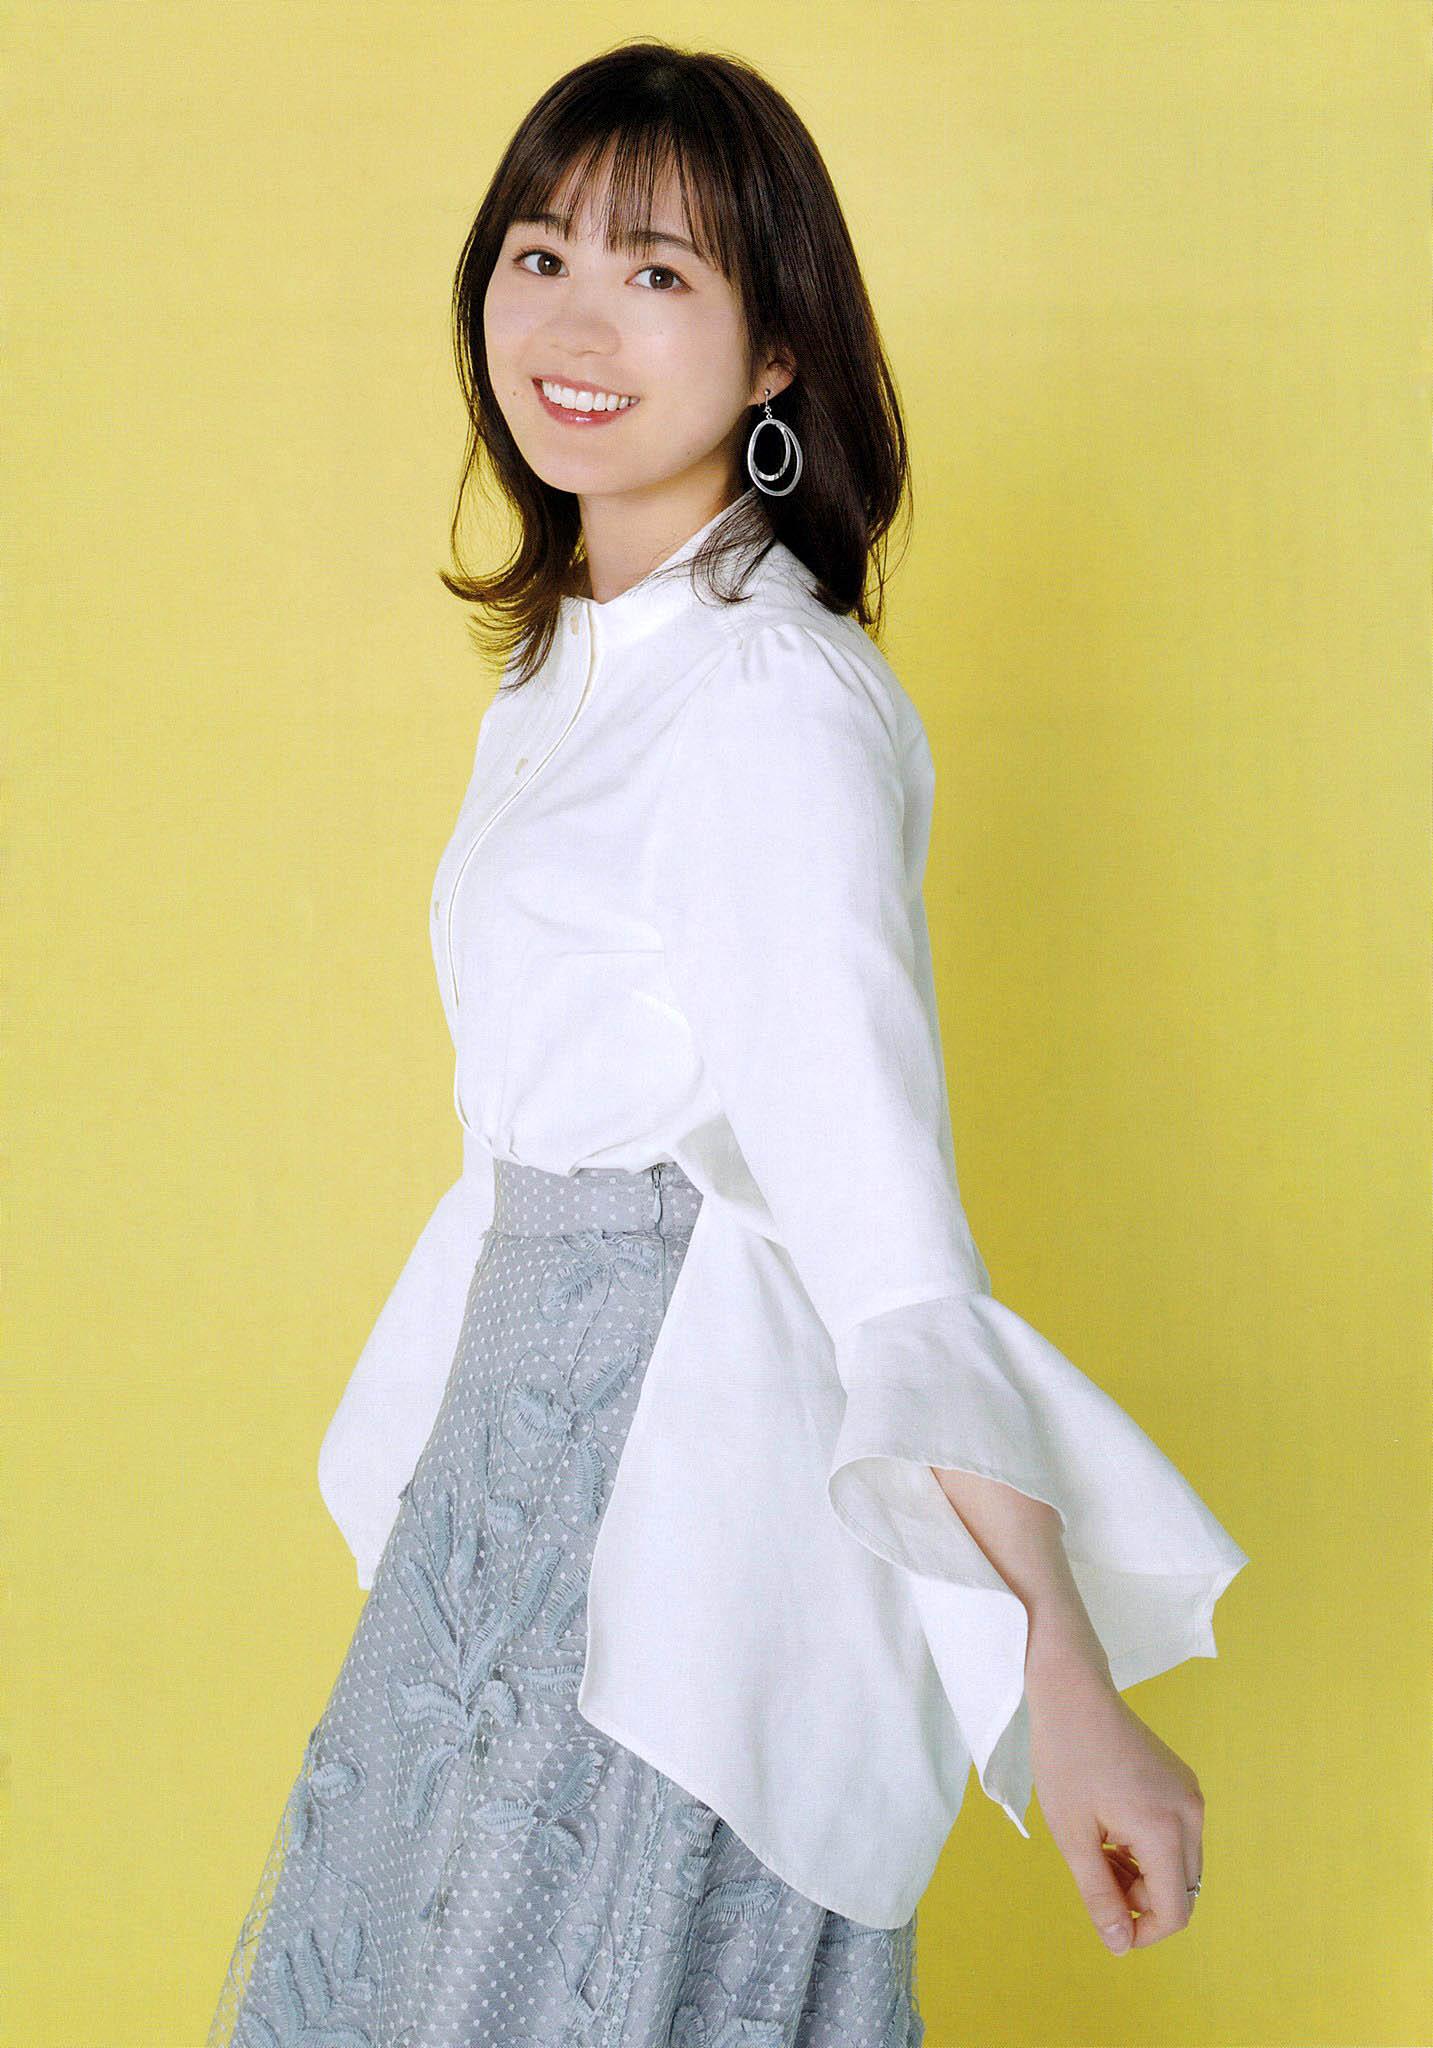 EIkuta SMatsumura Big One Girls 2105 03.jpg